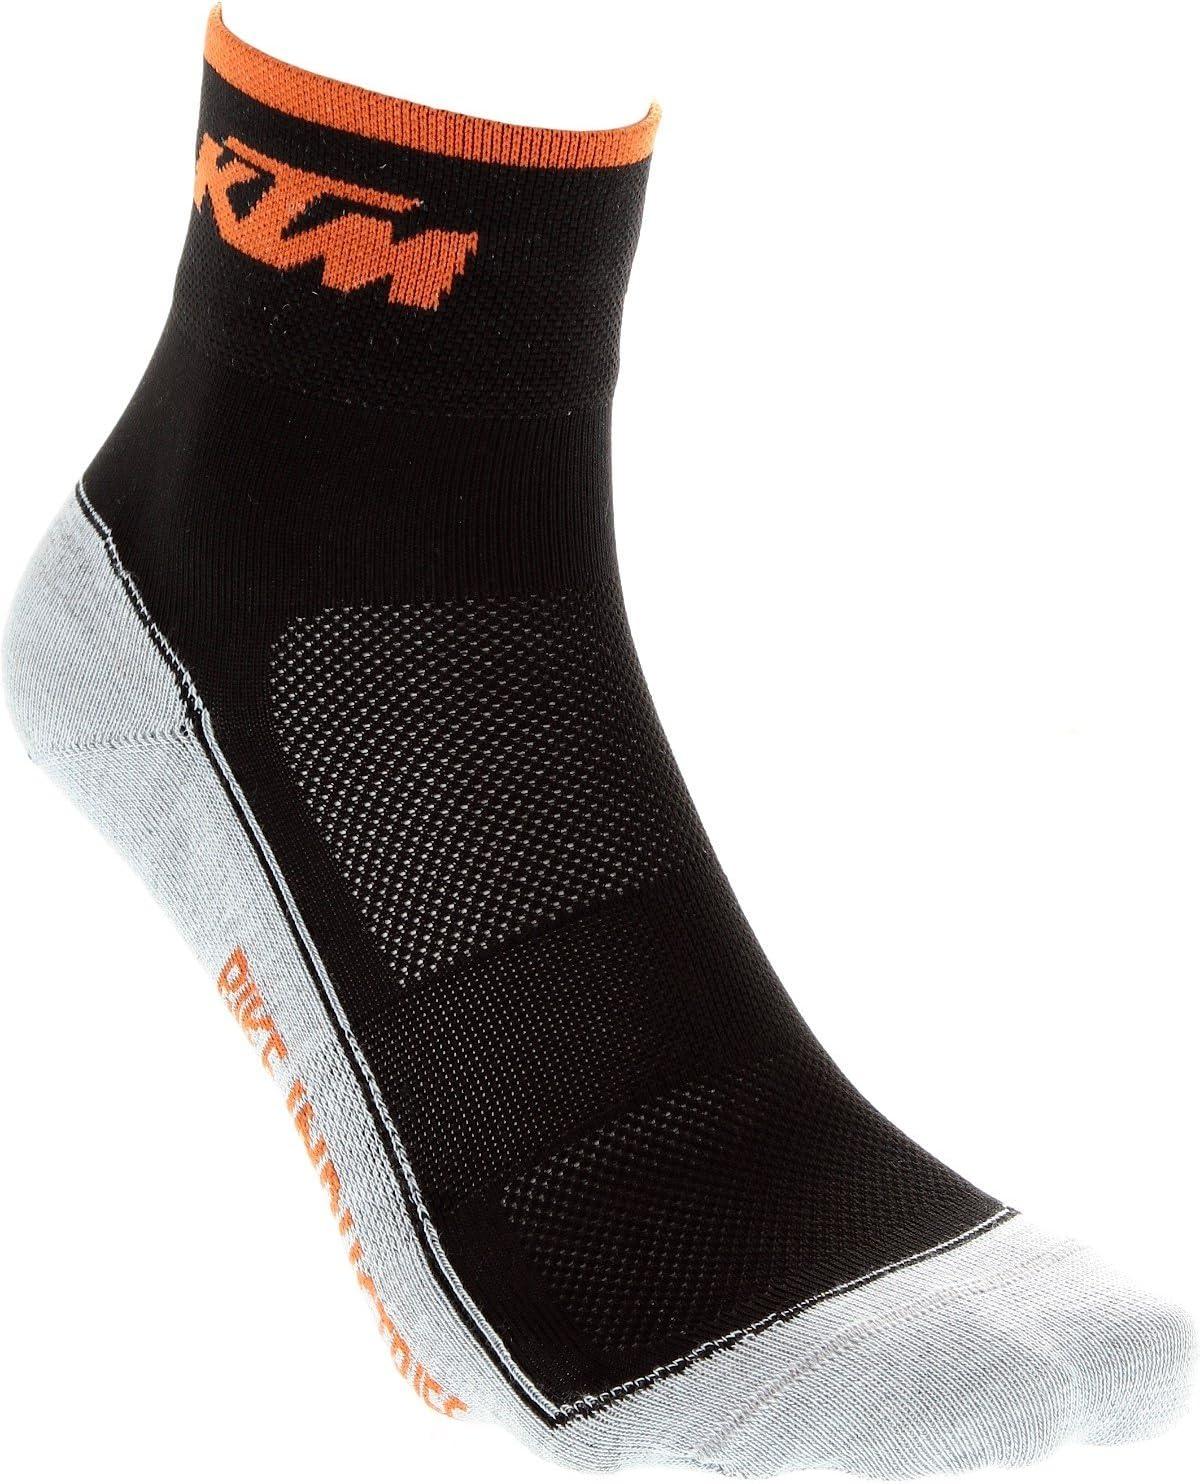 KTM Bike Socken Factory Uni Black